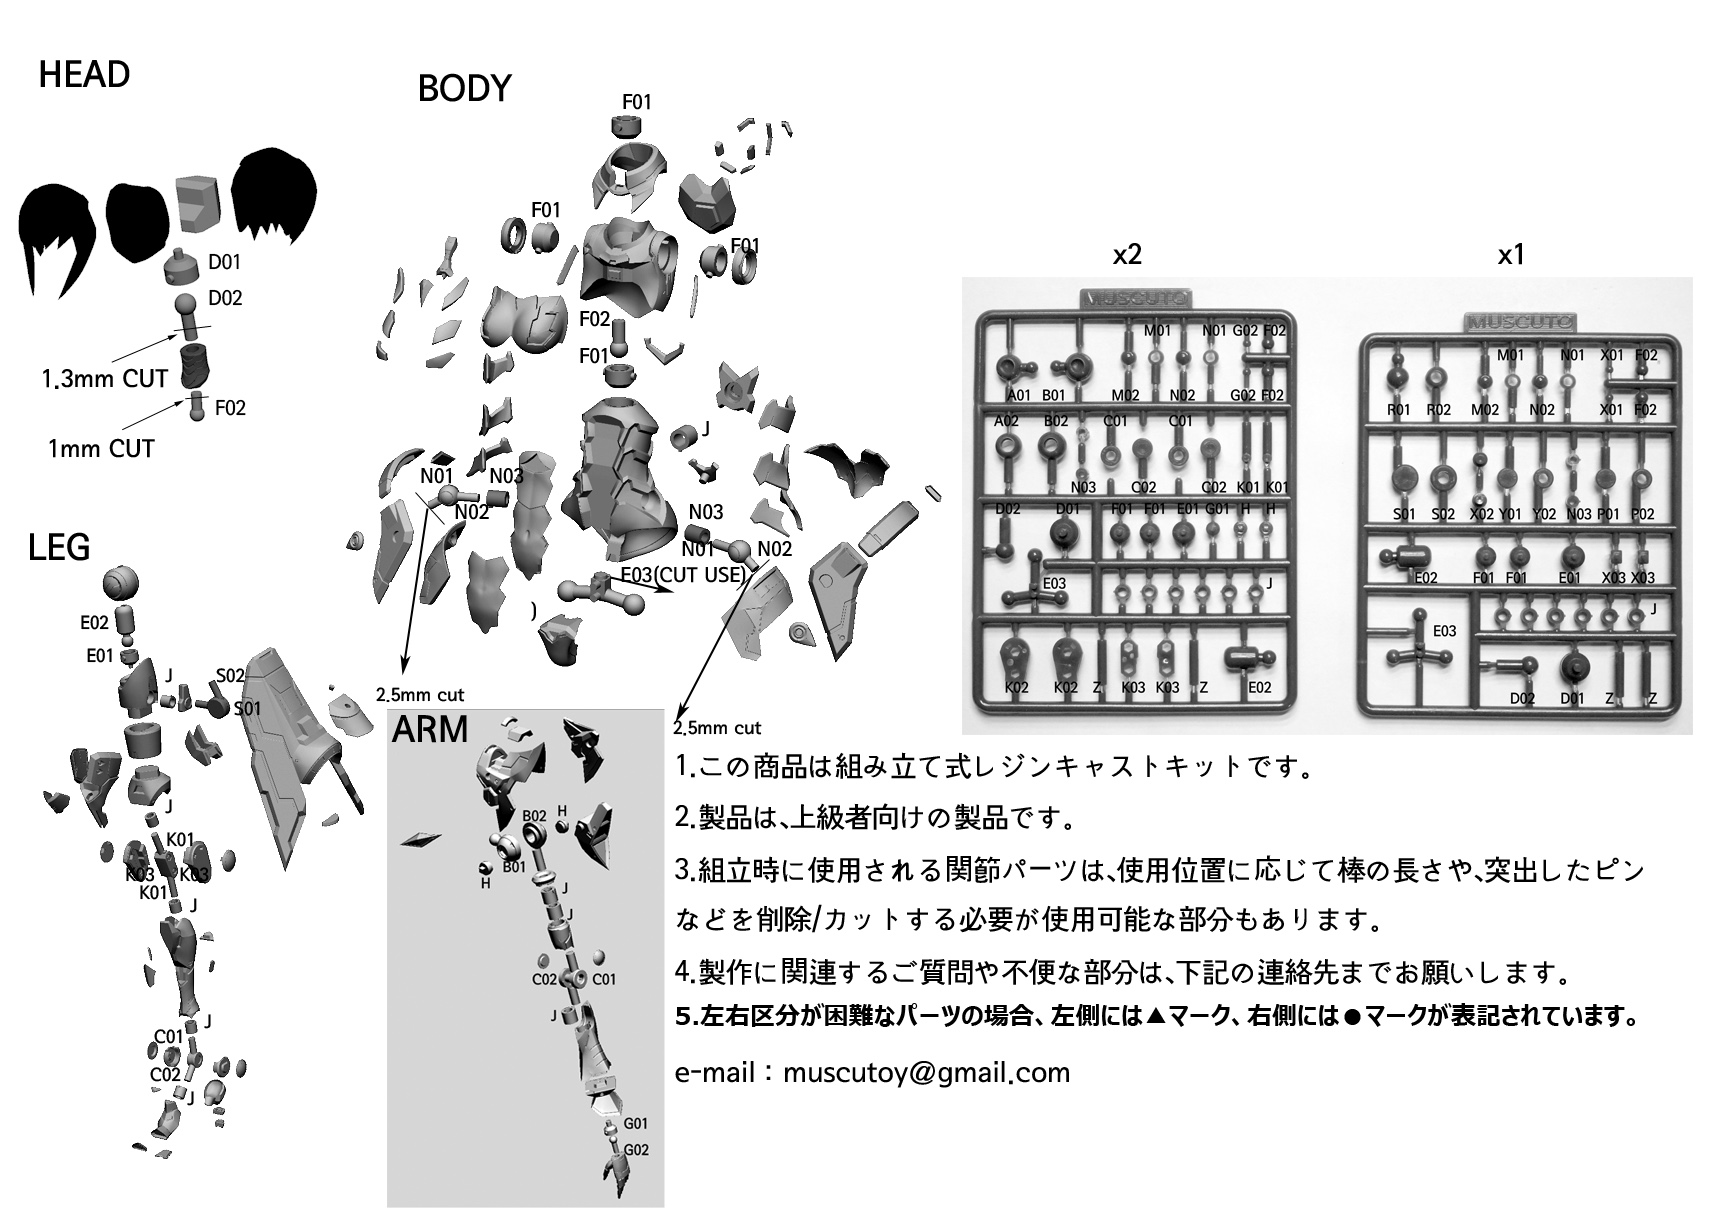 PM츠키네코설명서 뒤 최신일본(좌우표시) 사본 사본.jpg